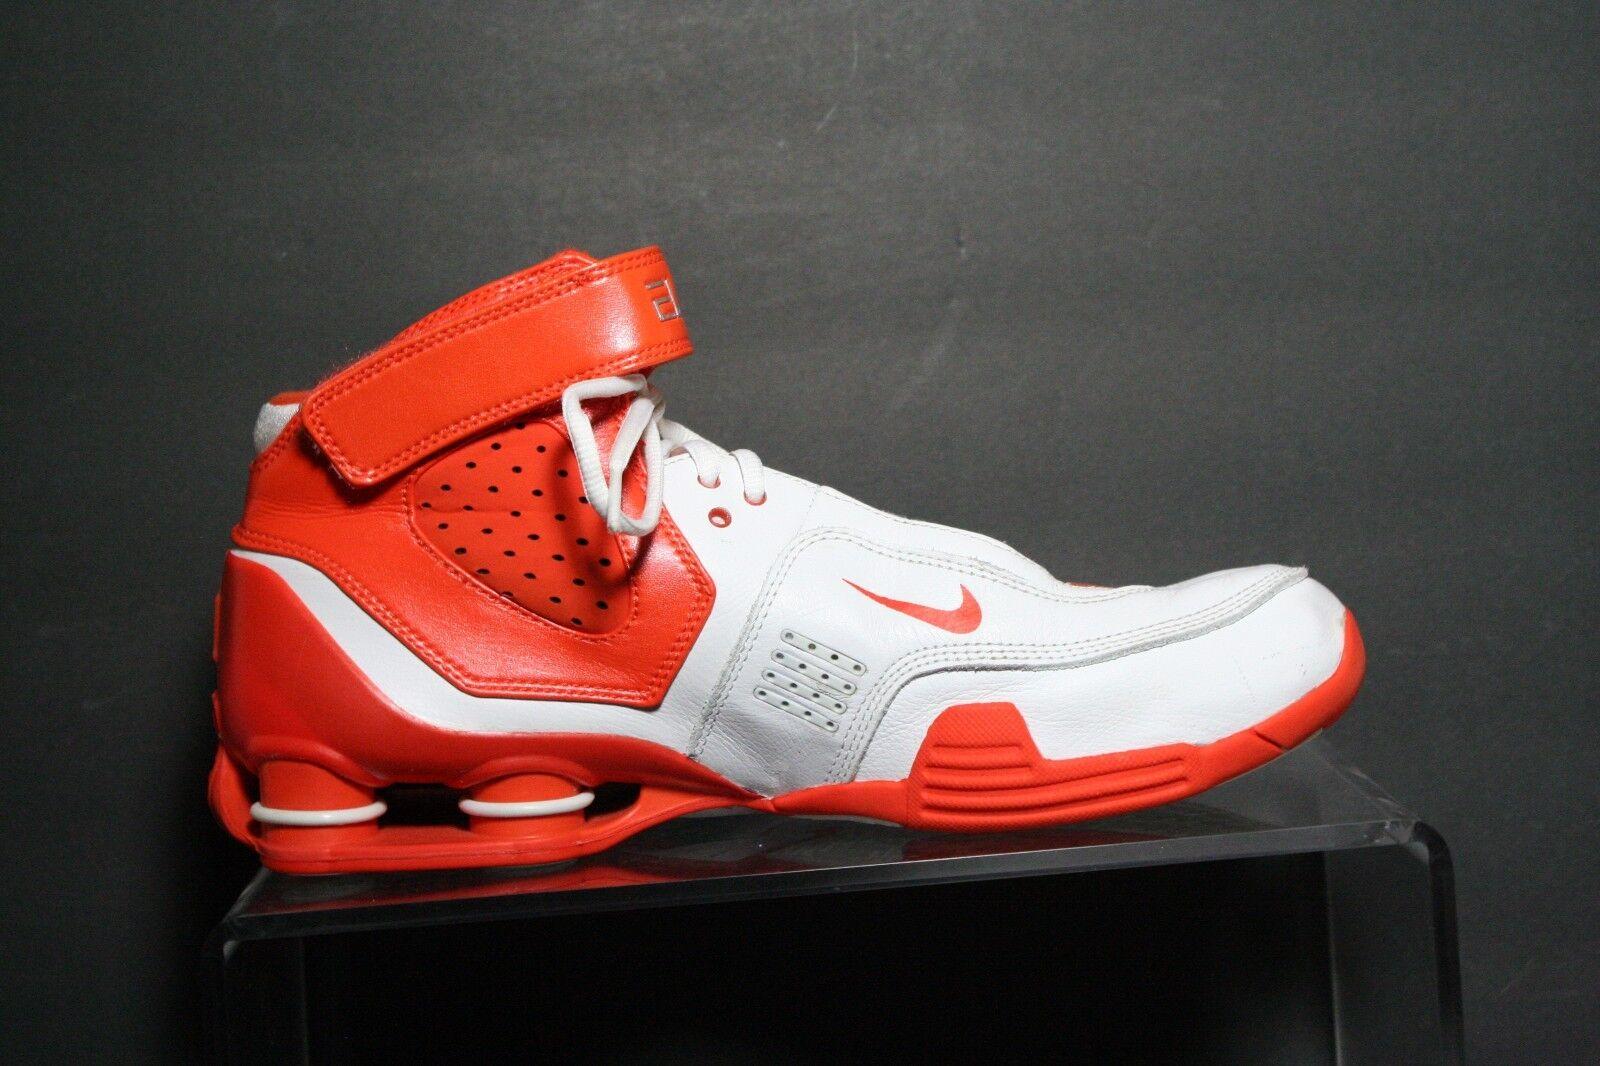 8b22a98250c7 ... Nike Shox Elite TB Basketball Sneaker  06 Multi Multi Multi White  Orange Tennessee Men 9 ...